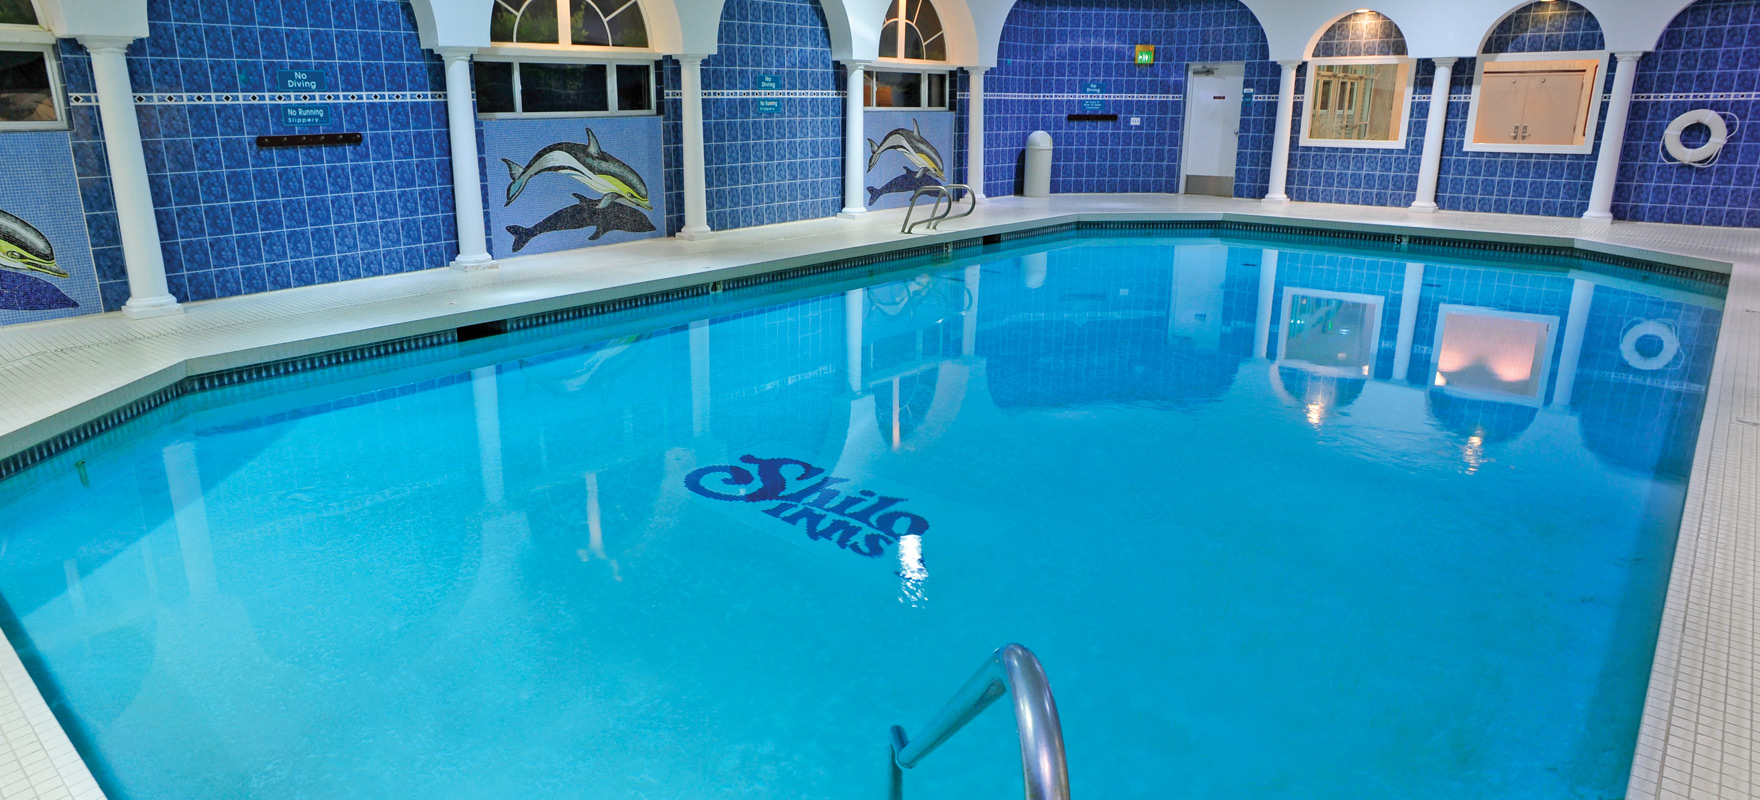 OFFICIAL WEBSITE - Shilo Inns Suites Hotels bwin apuestas - Ocean Shores ...